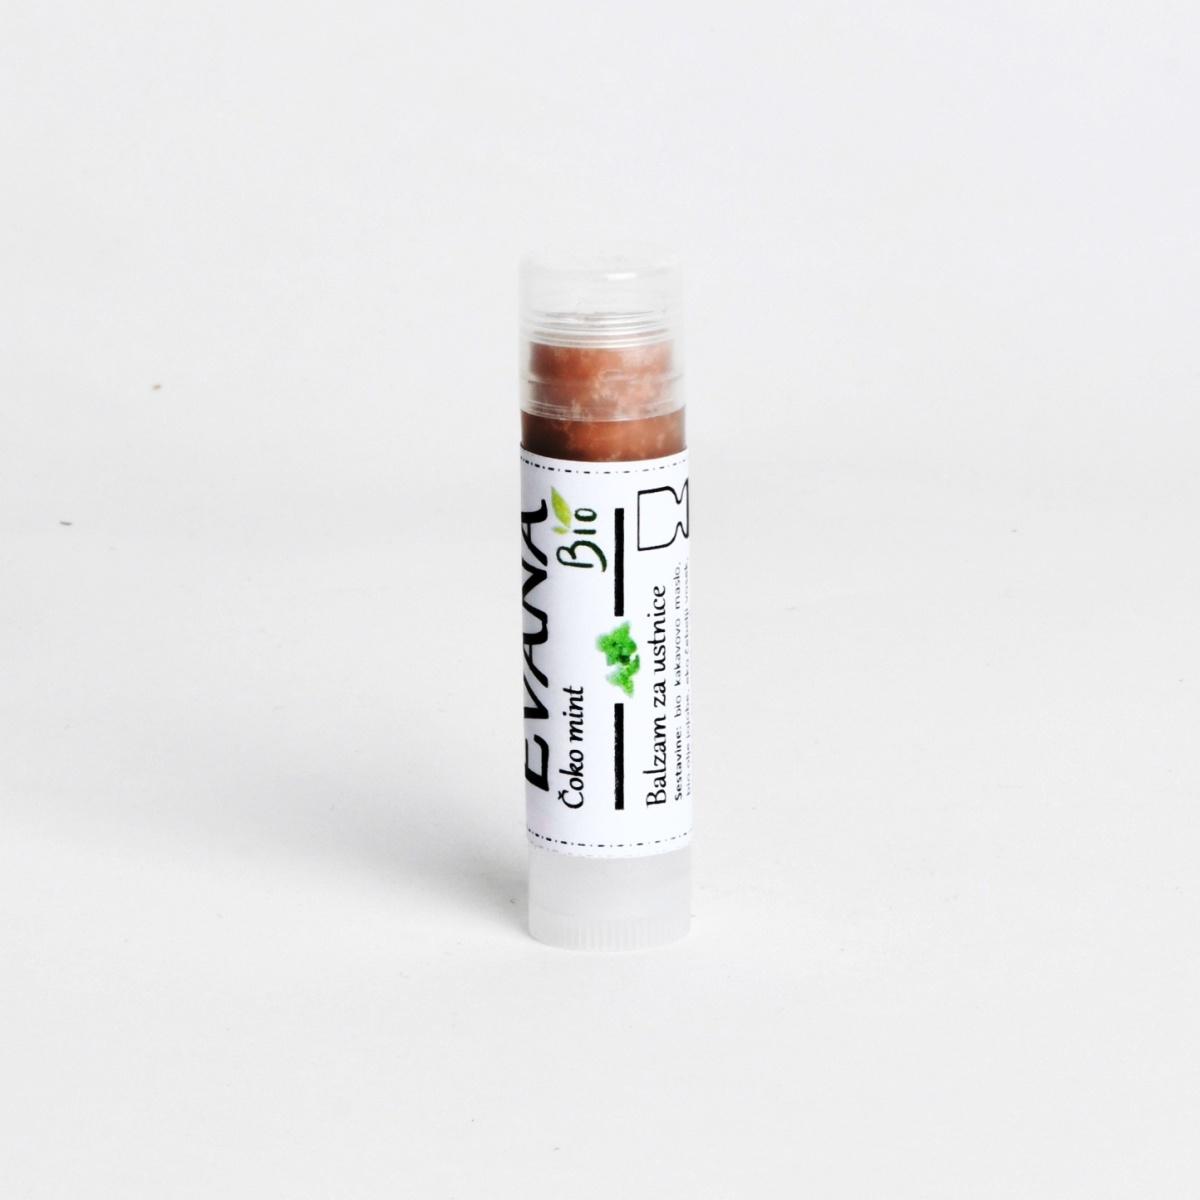 BIO balzam za ustnice 03 01 02 005